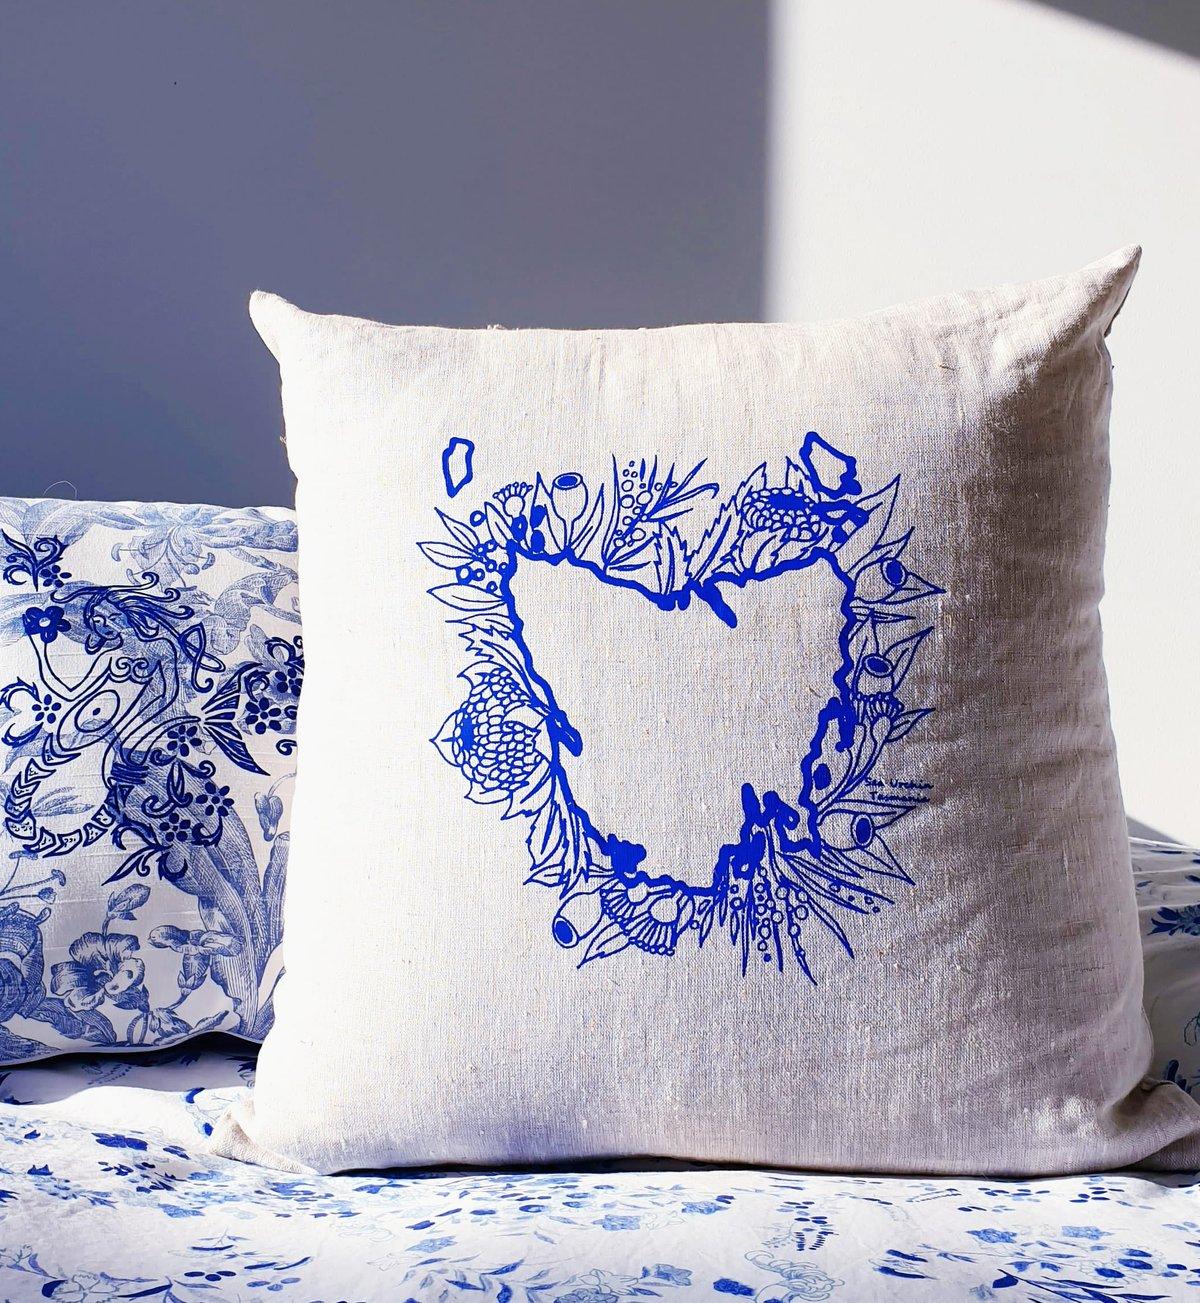 Totally Tasmania Cushion Cover in Oatmeal Linen - Blue design